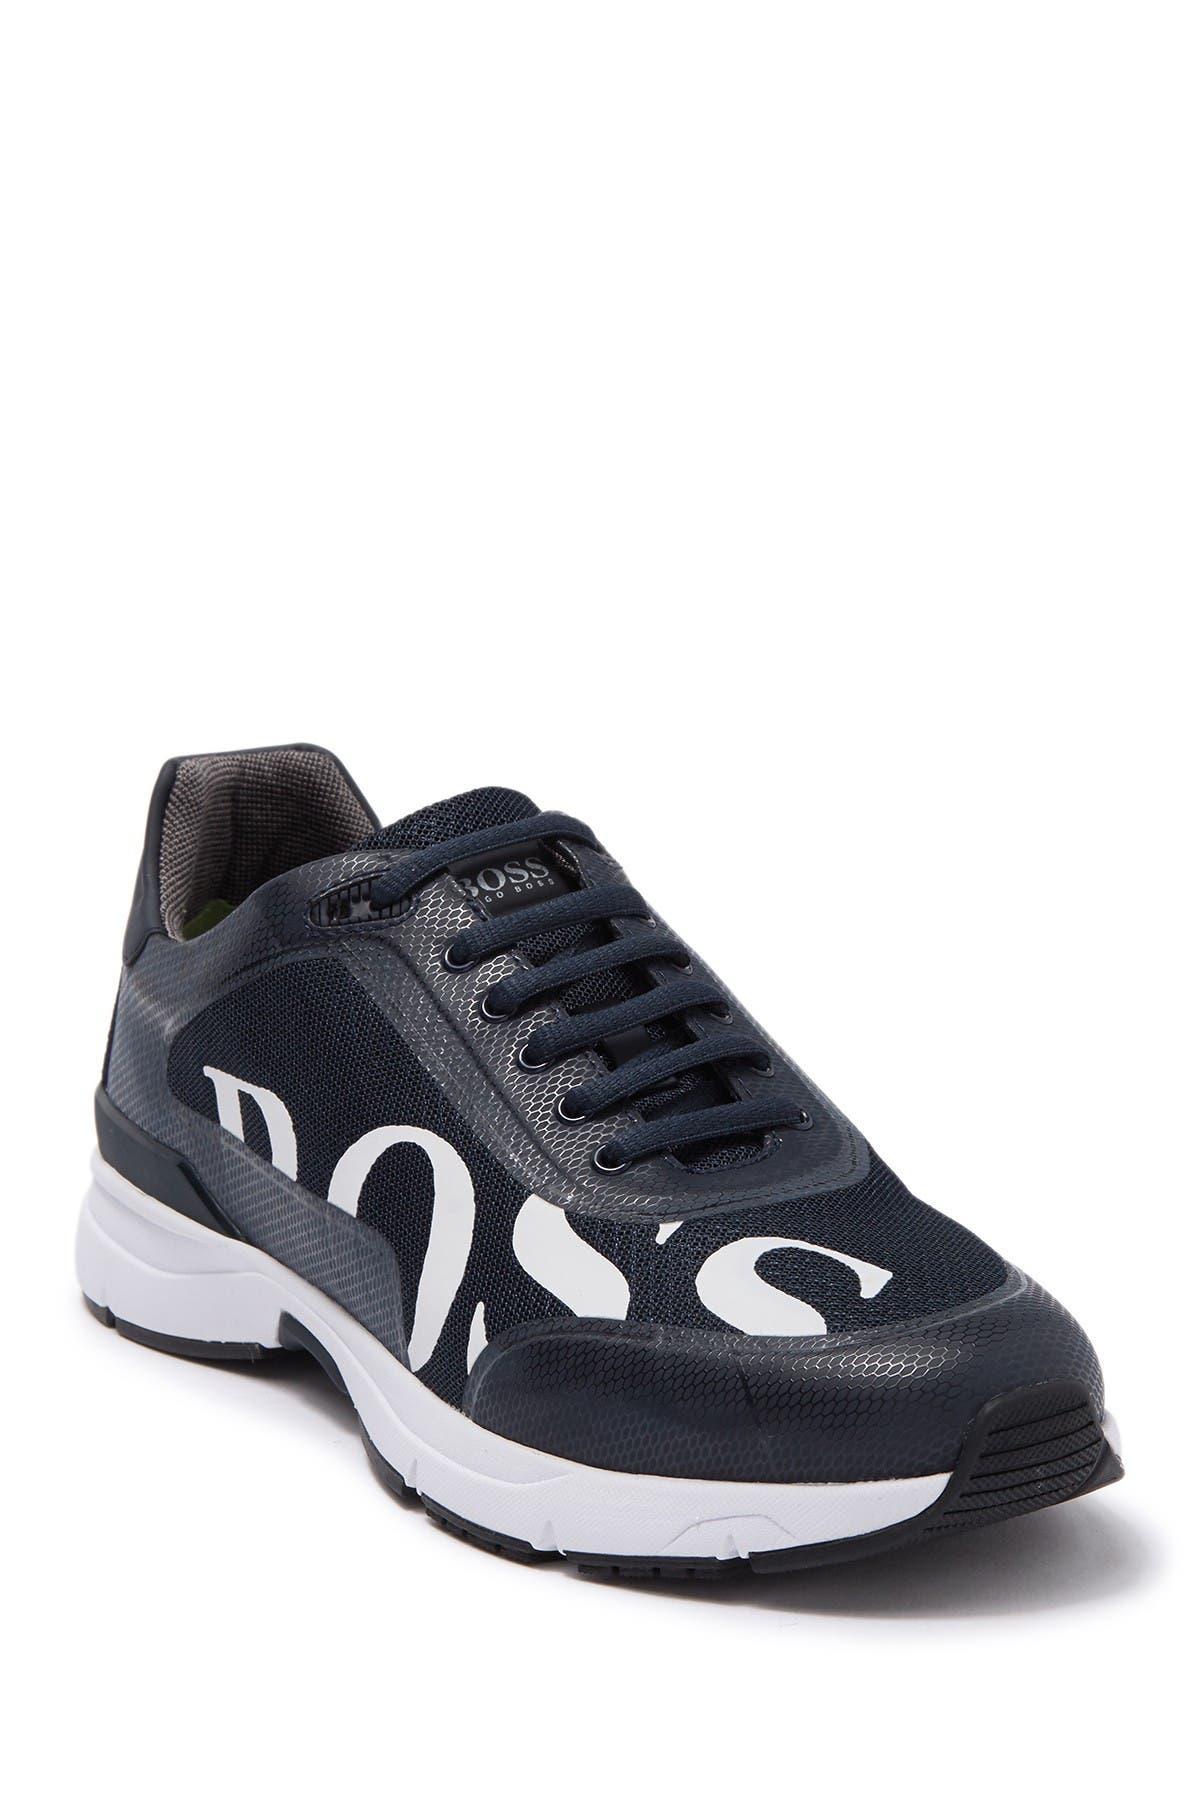 Image of BOSS Velocity Run Logo 2 Sneaker